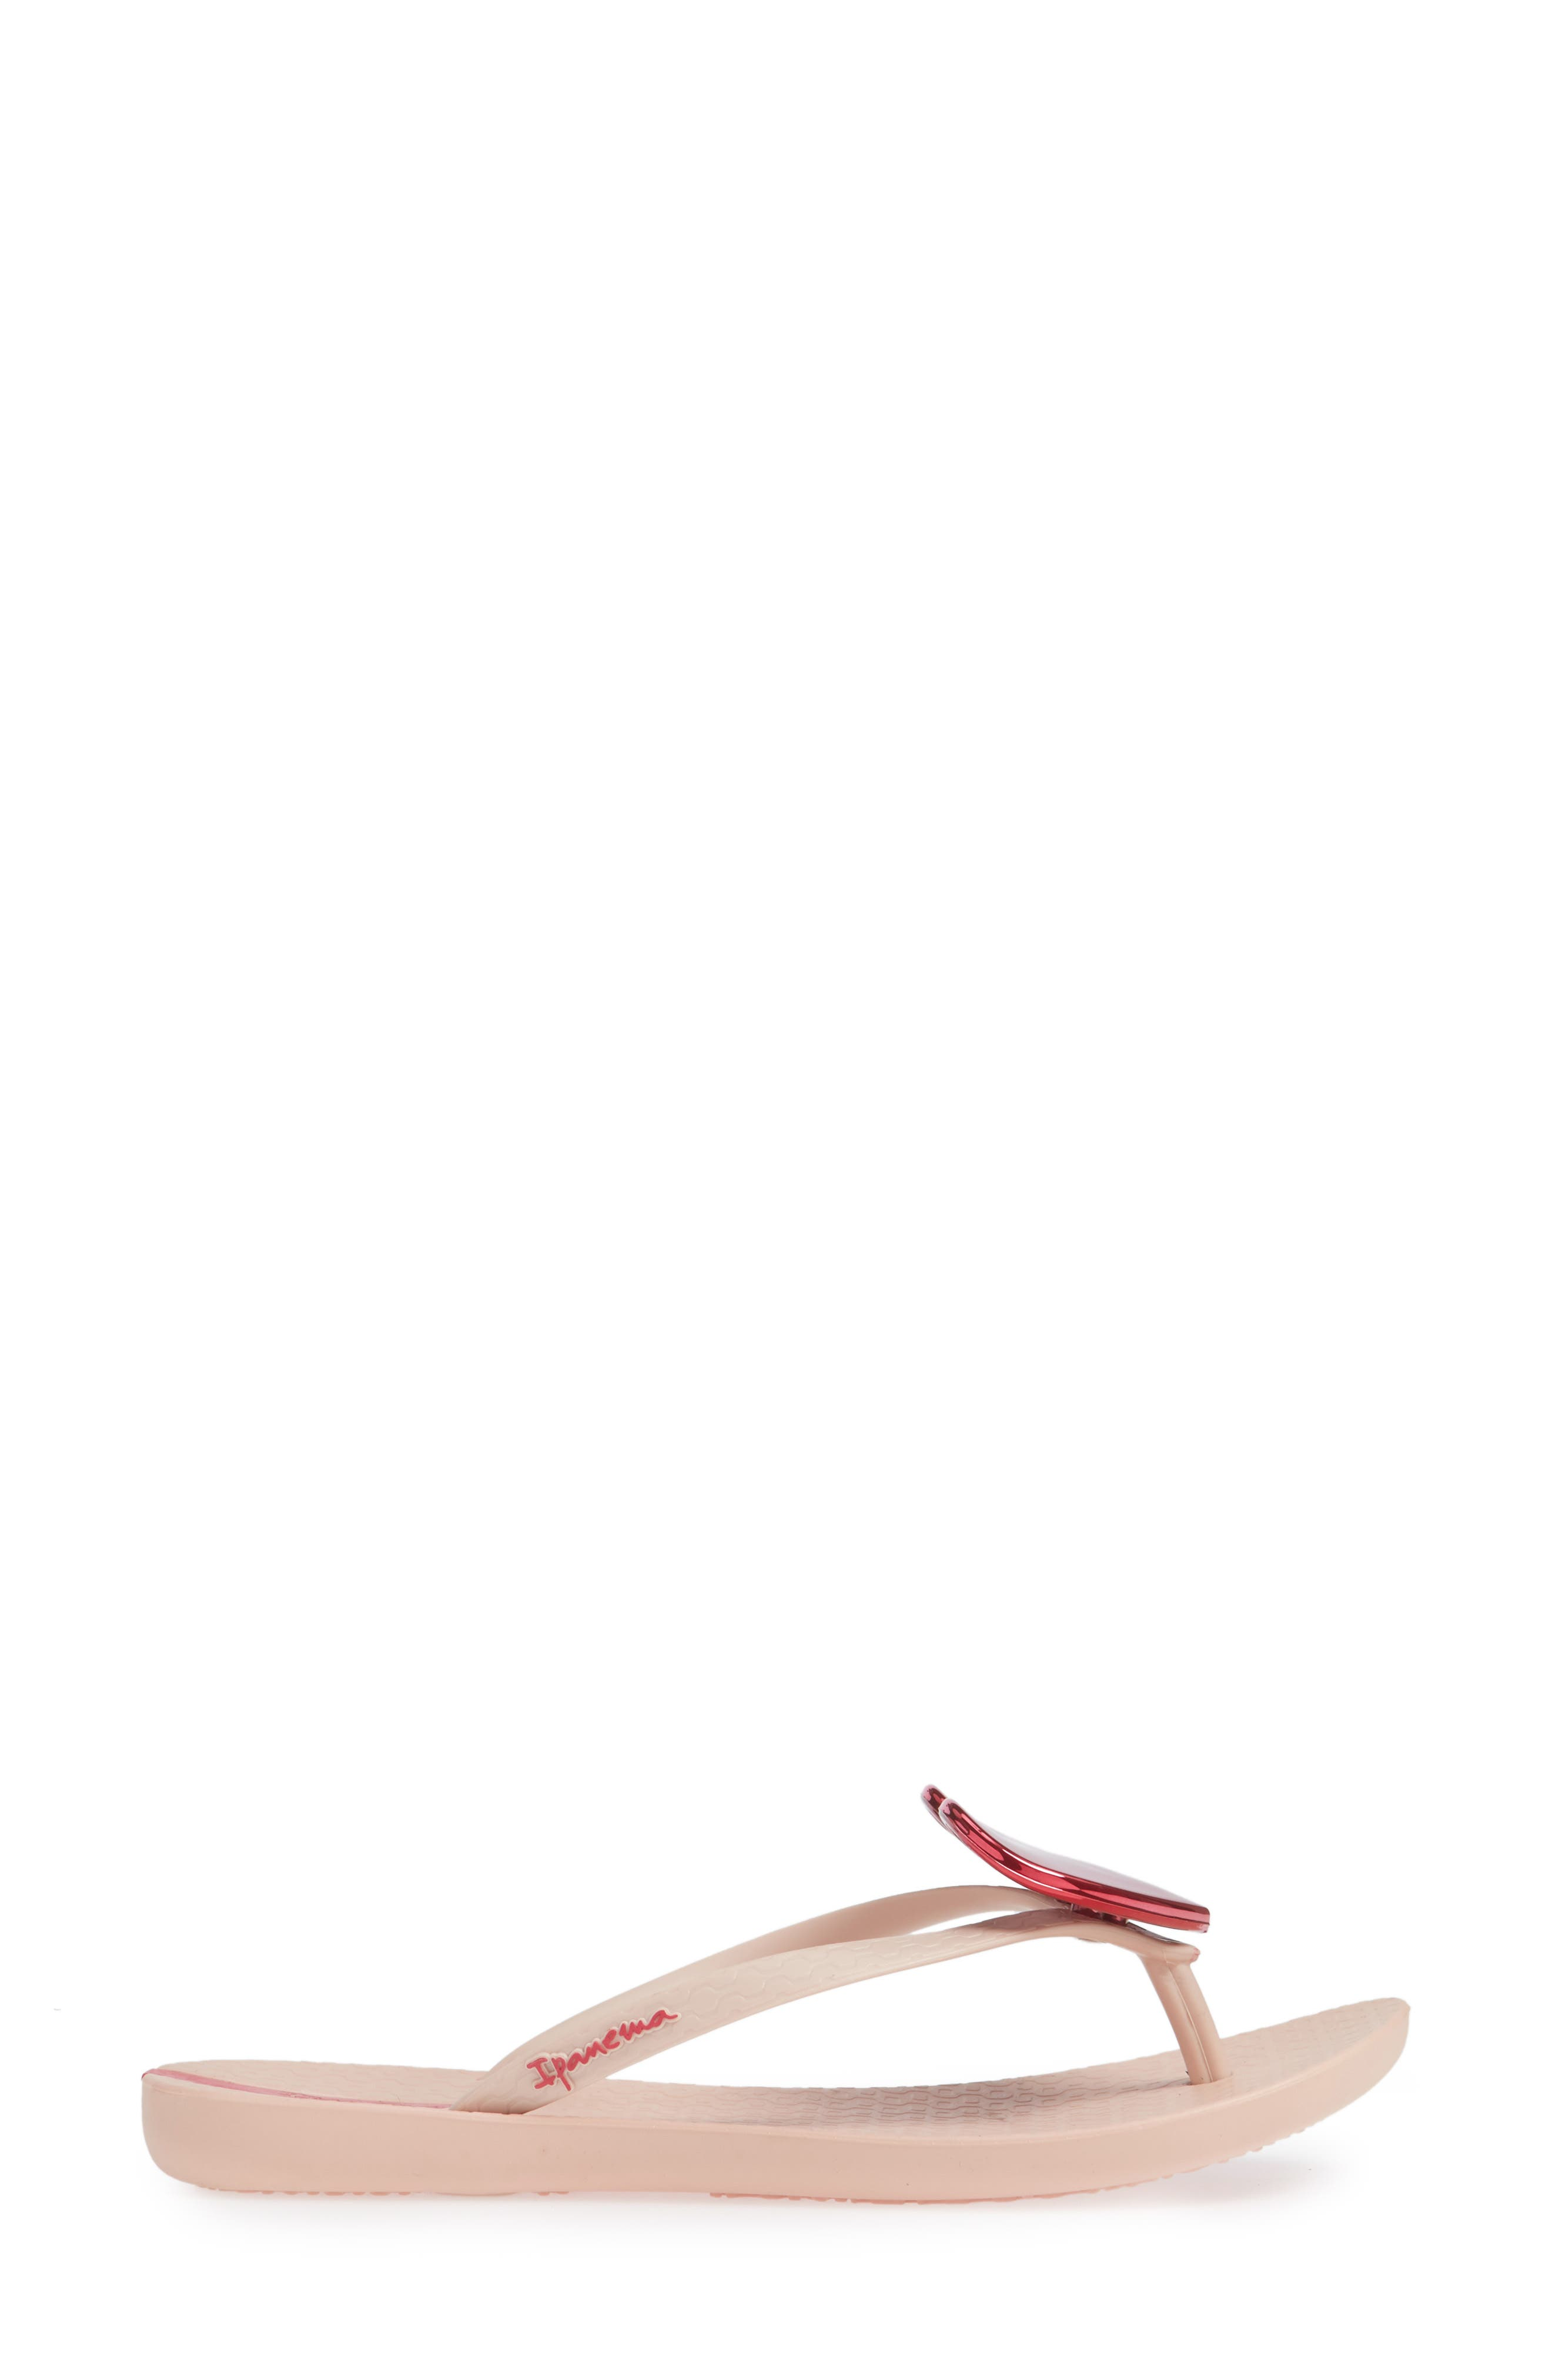 Wave Heart Flip Flop,                             Alternate thumbnail 6, color,                             Pink/ Pink